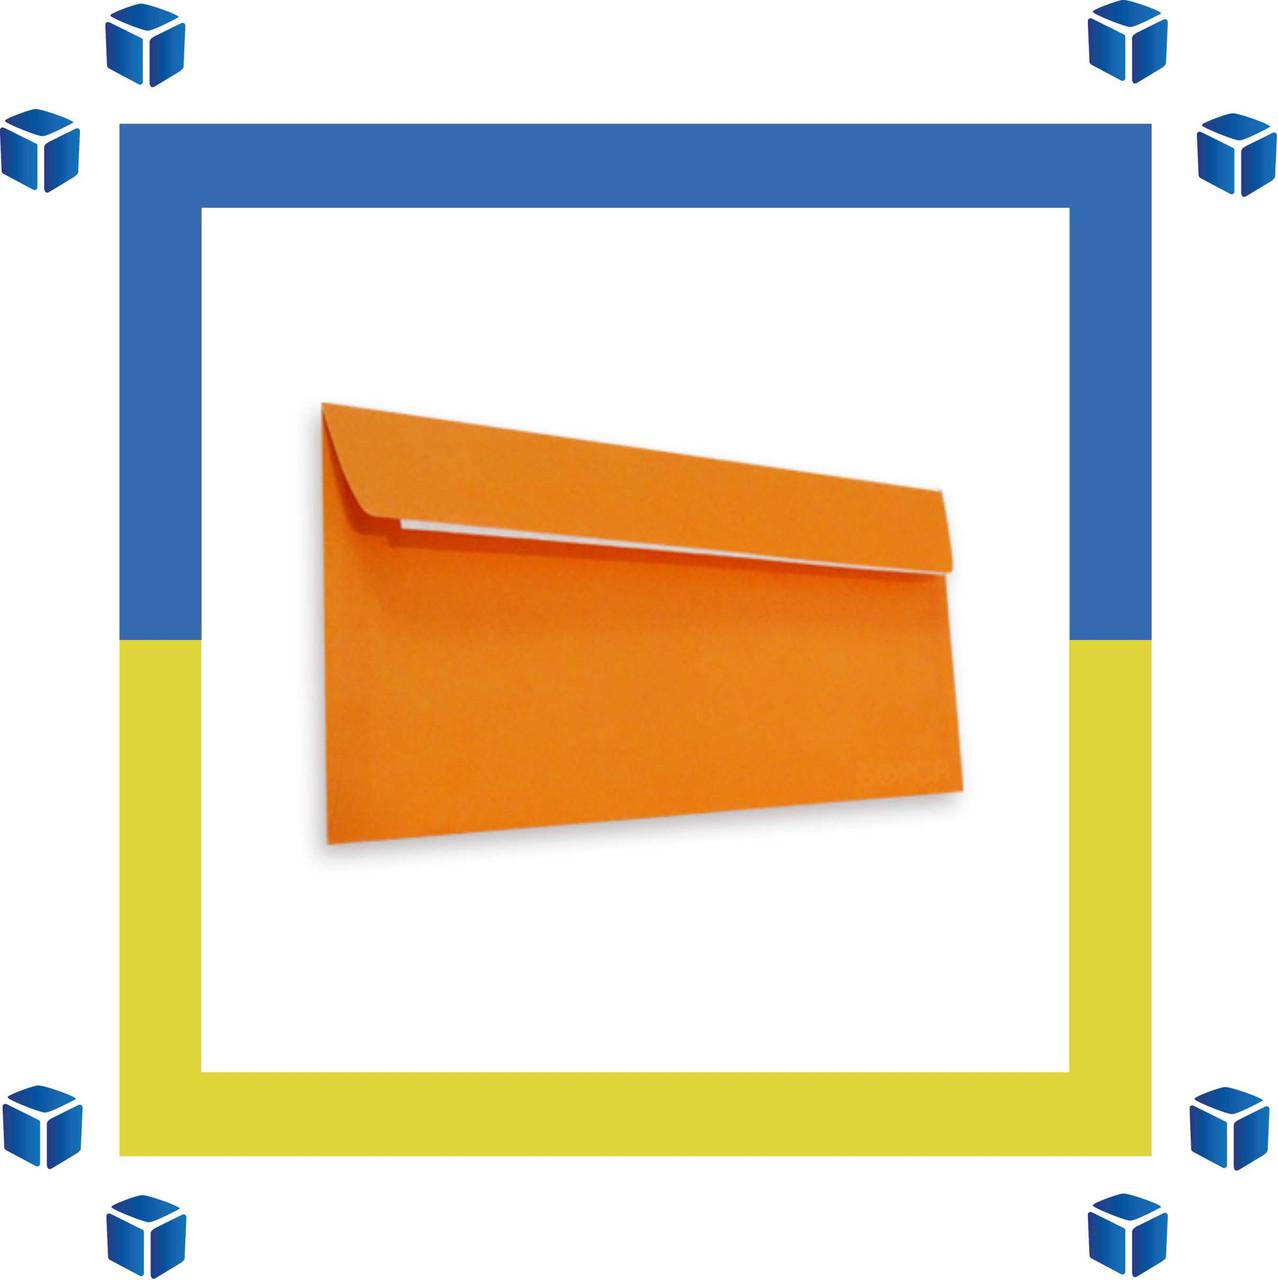 Конверт Е65 (DL) (110х220) скл, оранжевый (0+0)